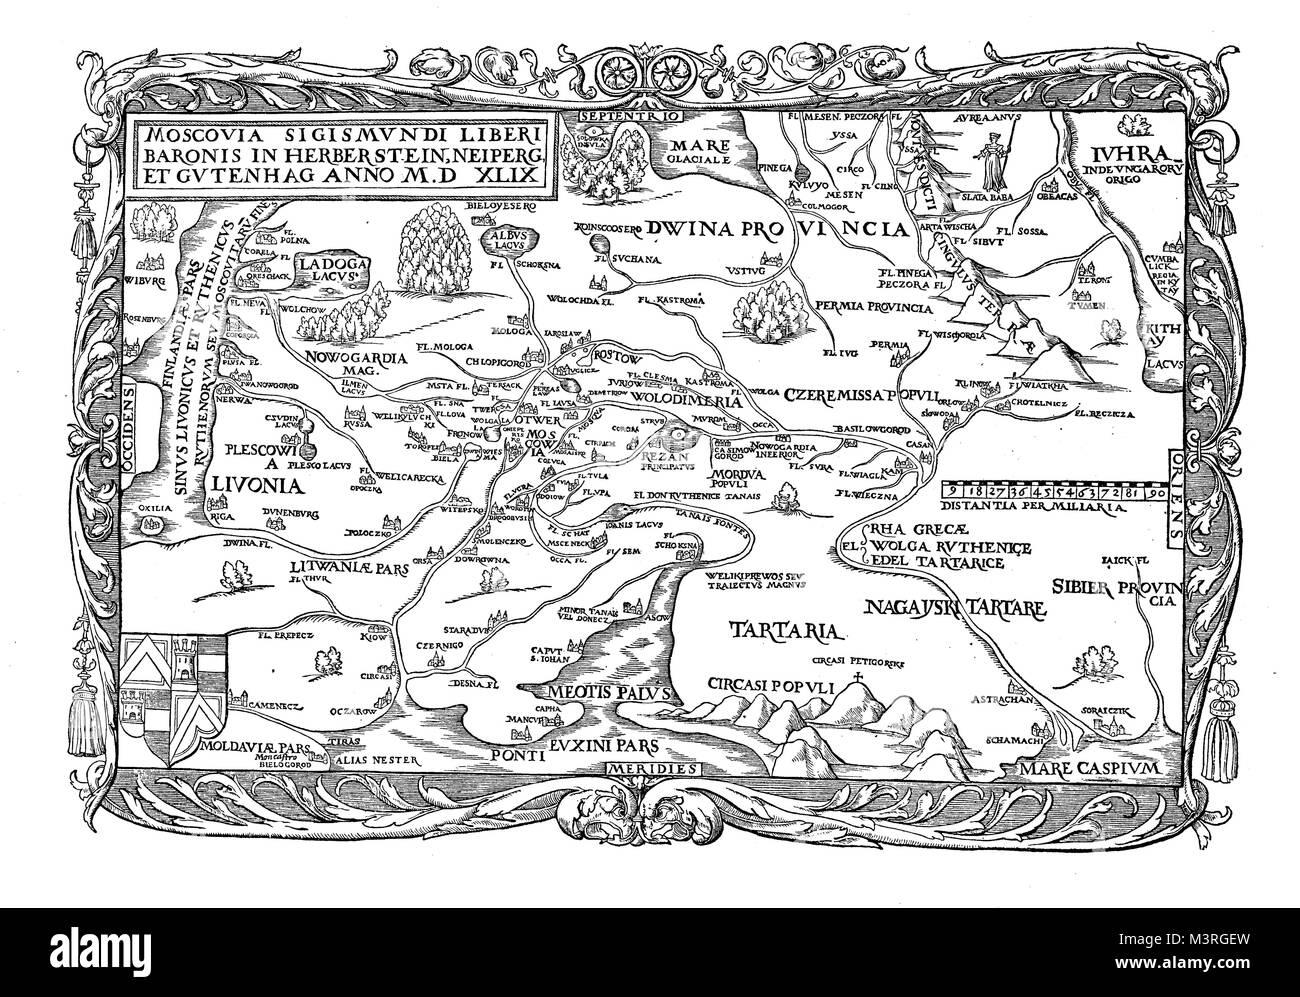 Holy Roman Empire diplomat Baron Sigismund von Herberstein chart of Russia, XVI century - Stock Image